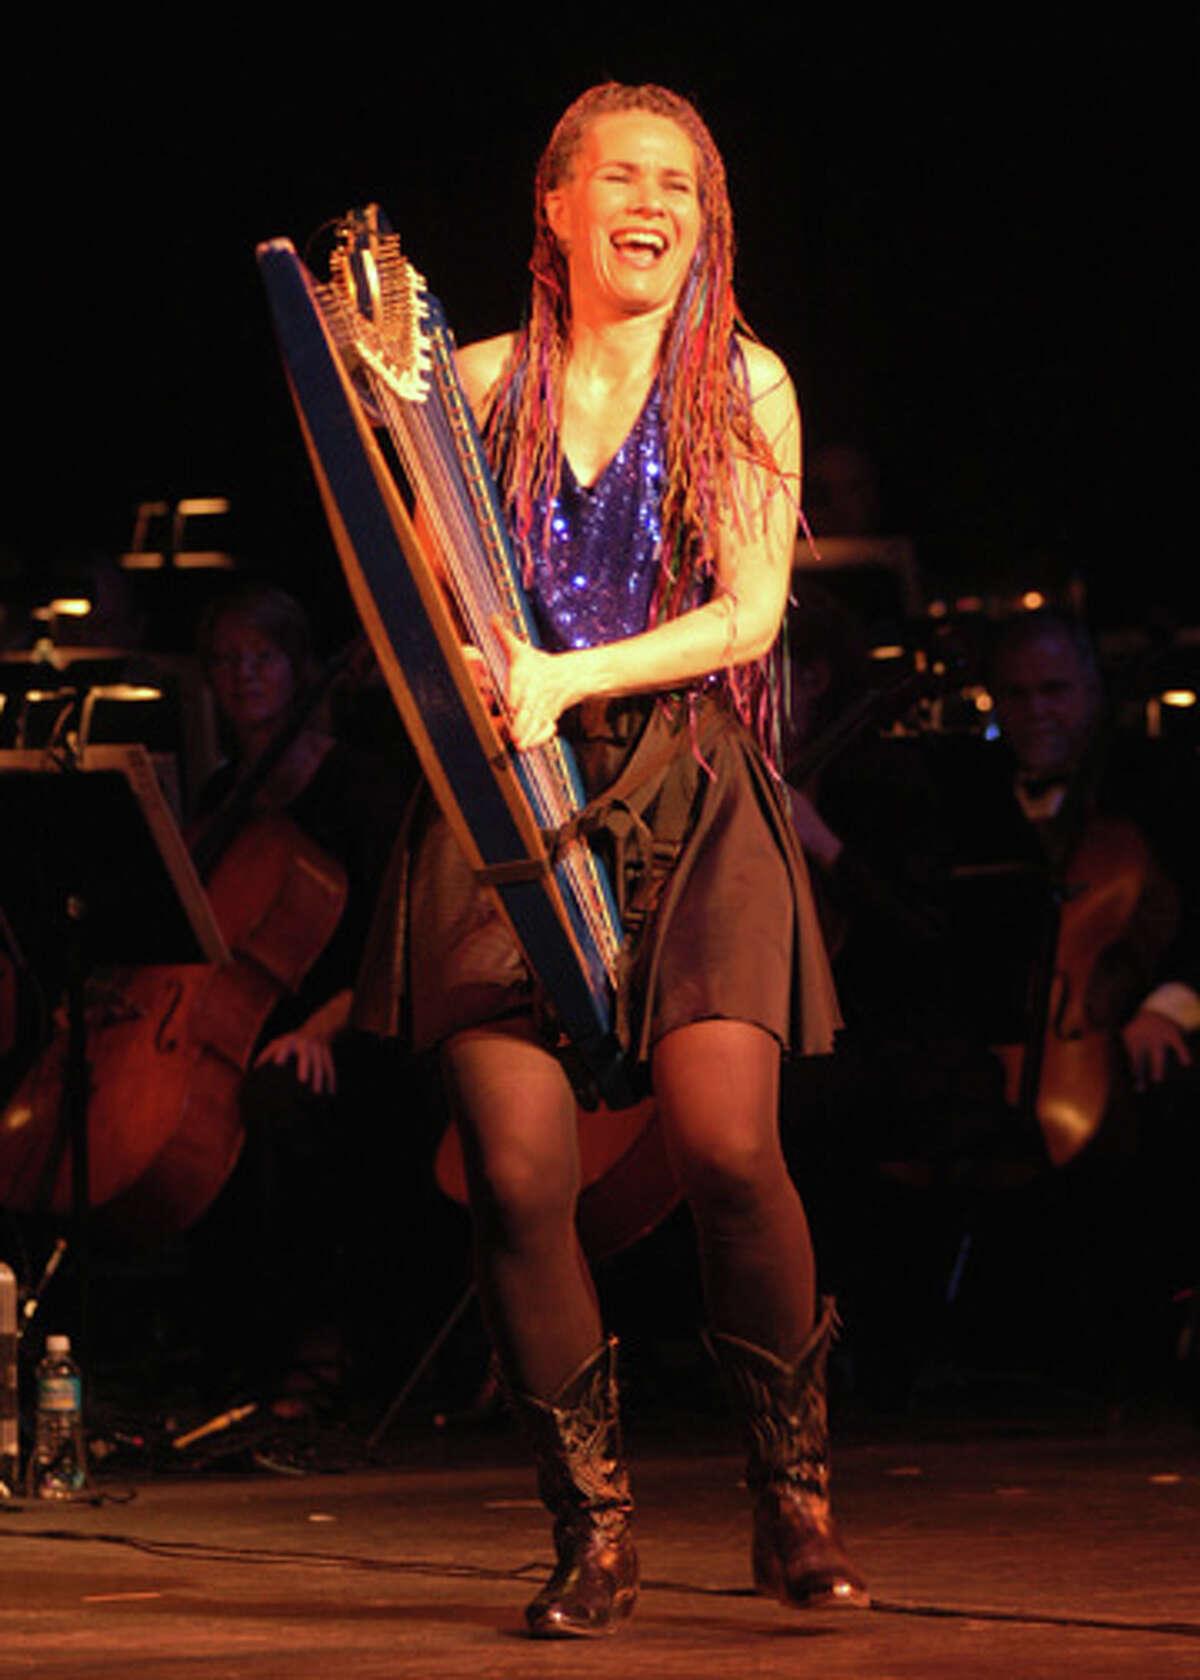 Harp player extraordinaire Deborah Henson-Conant performs at Edmond Town Hall in Newtown on Saturday, Feb. 4, at 7 p.m.